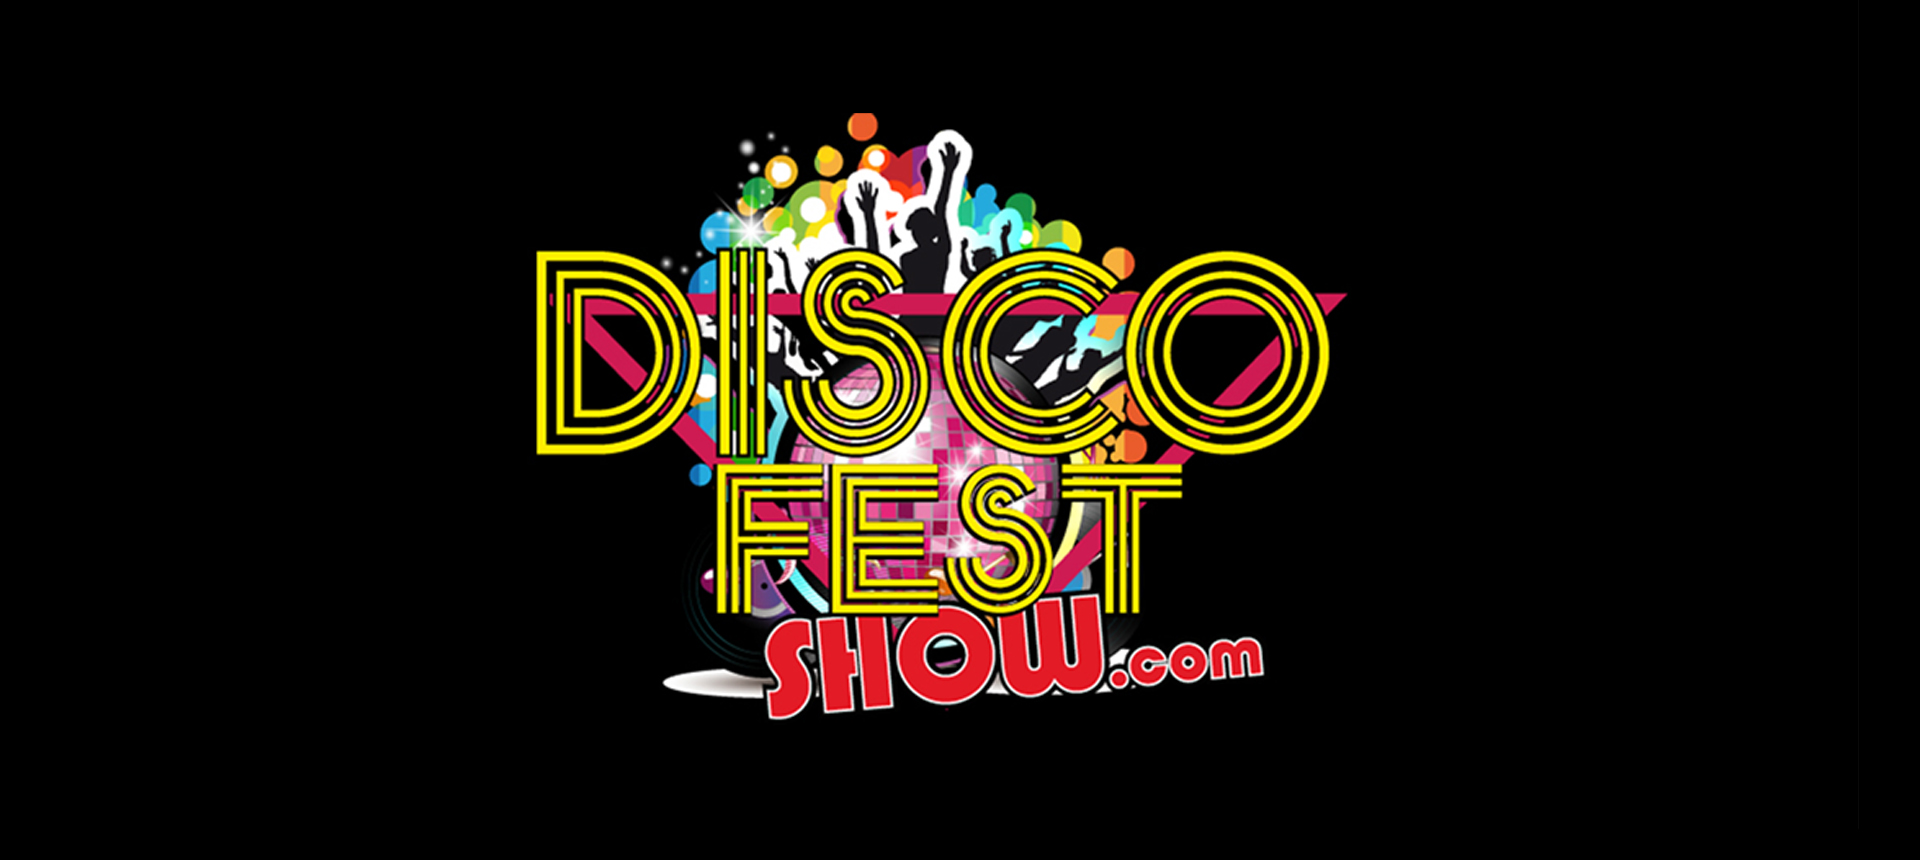 WIN Discofest show tickets